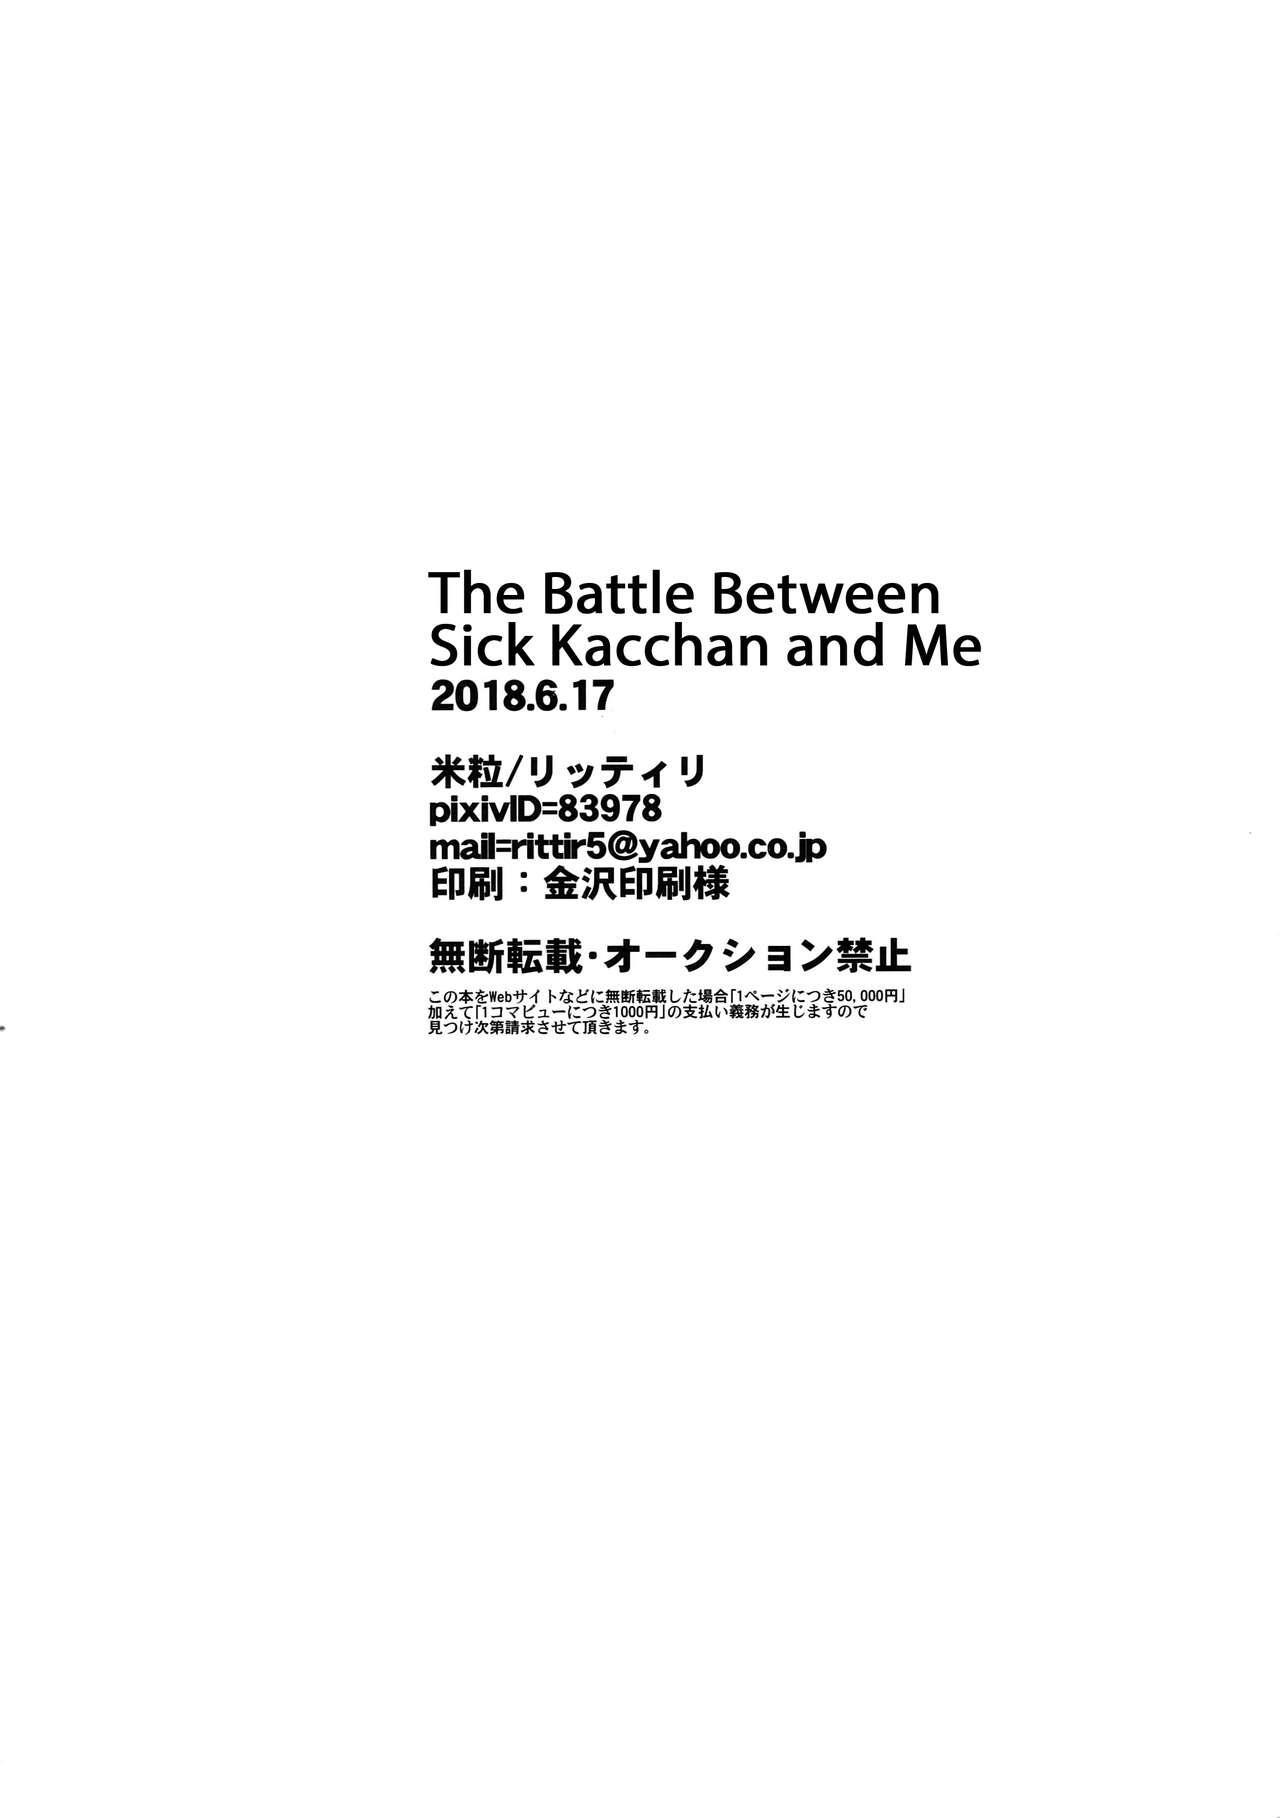 Kazehiki Kacchan to Boku no Koubousen | The Battle Between Sick Kacchan and Me 21